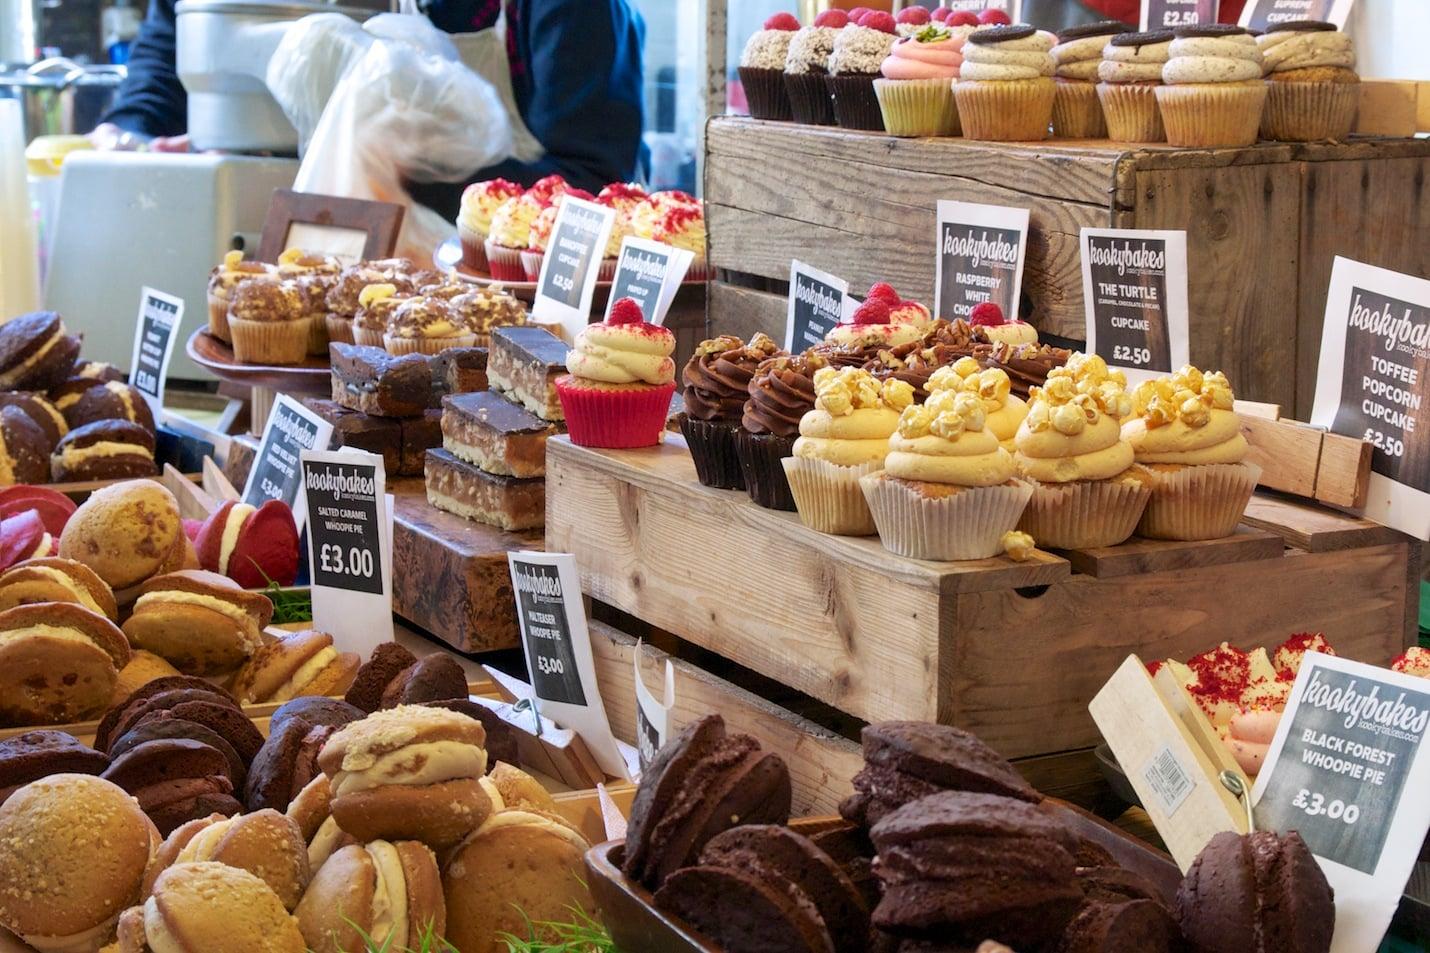 Birck Lane Market à Londres